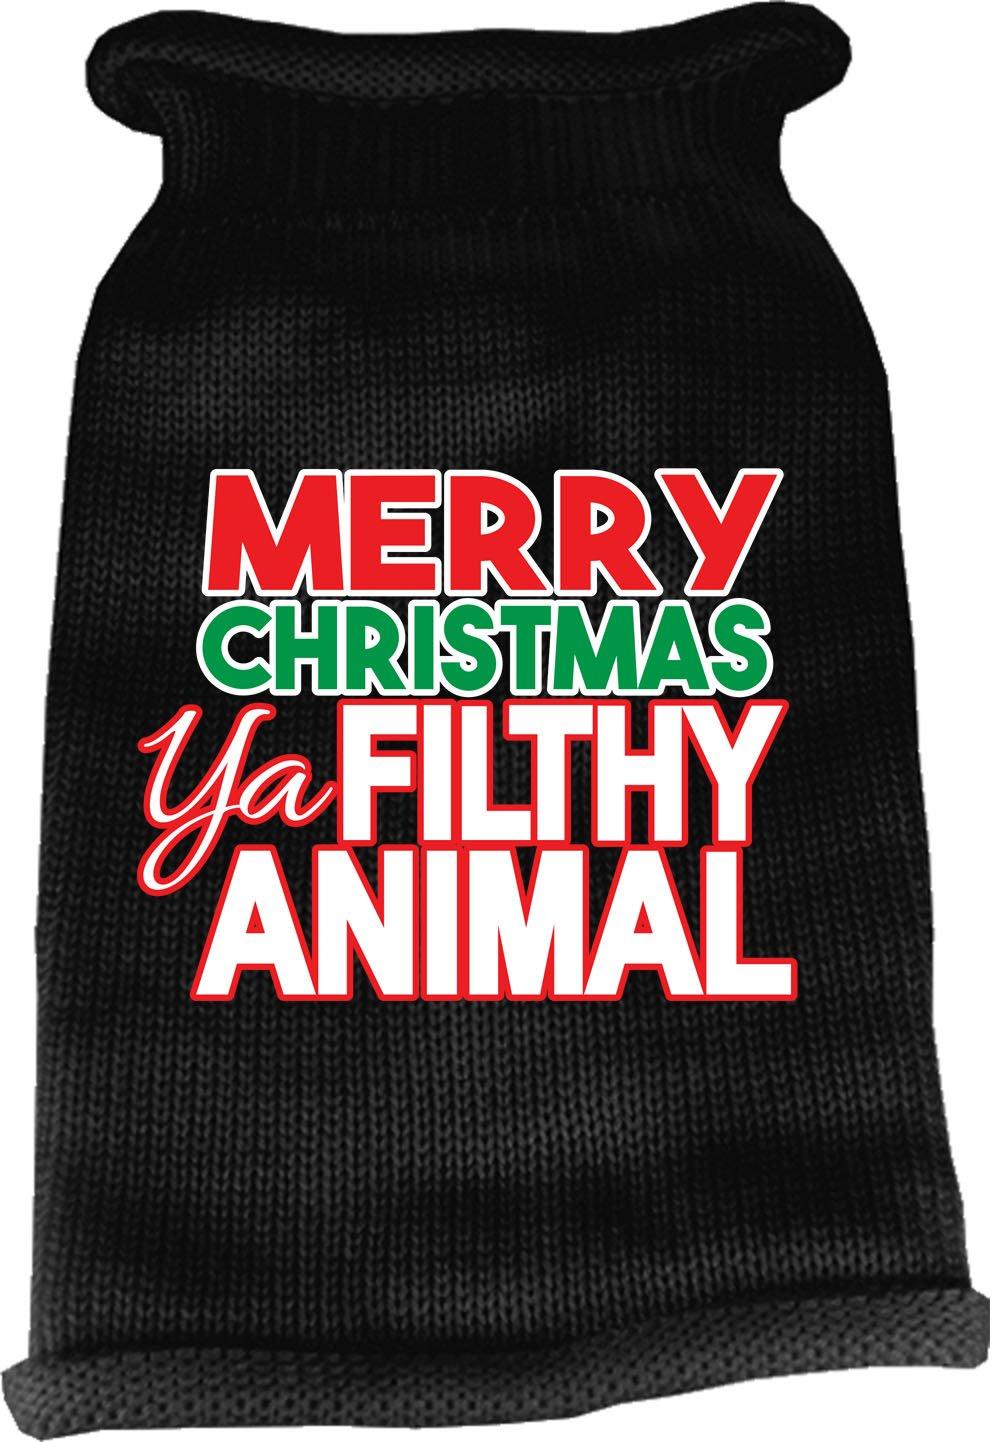 Mirage Pet Products 621-16 SMBK Ya Filthy Animal Screen Print Knit Black Pet Sweater, Small